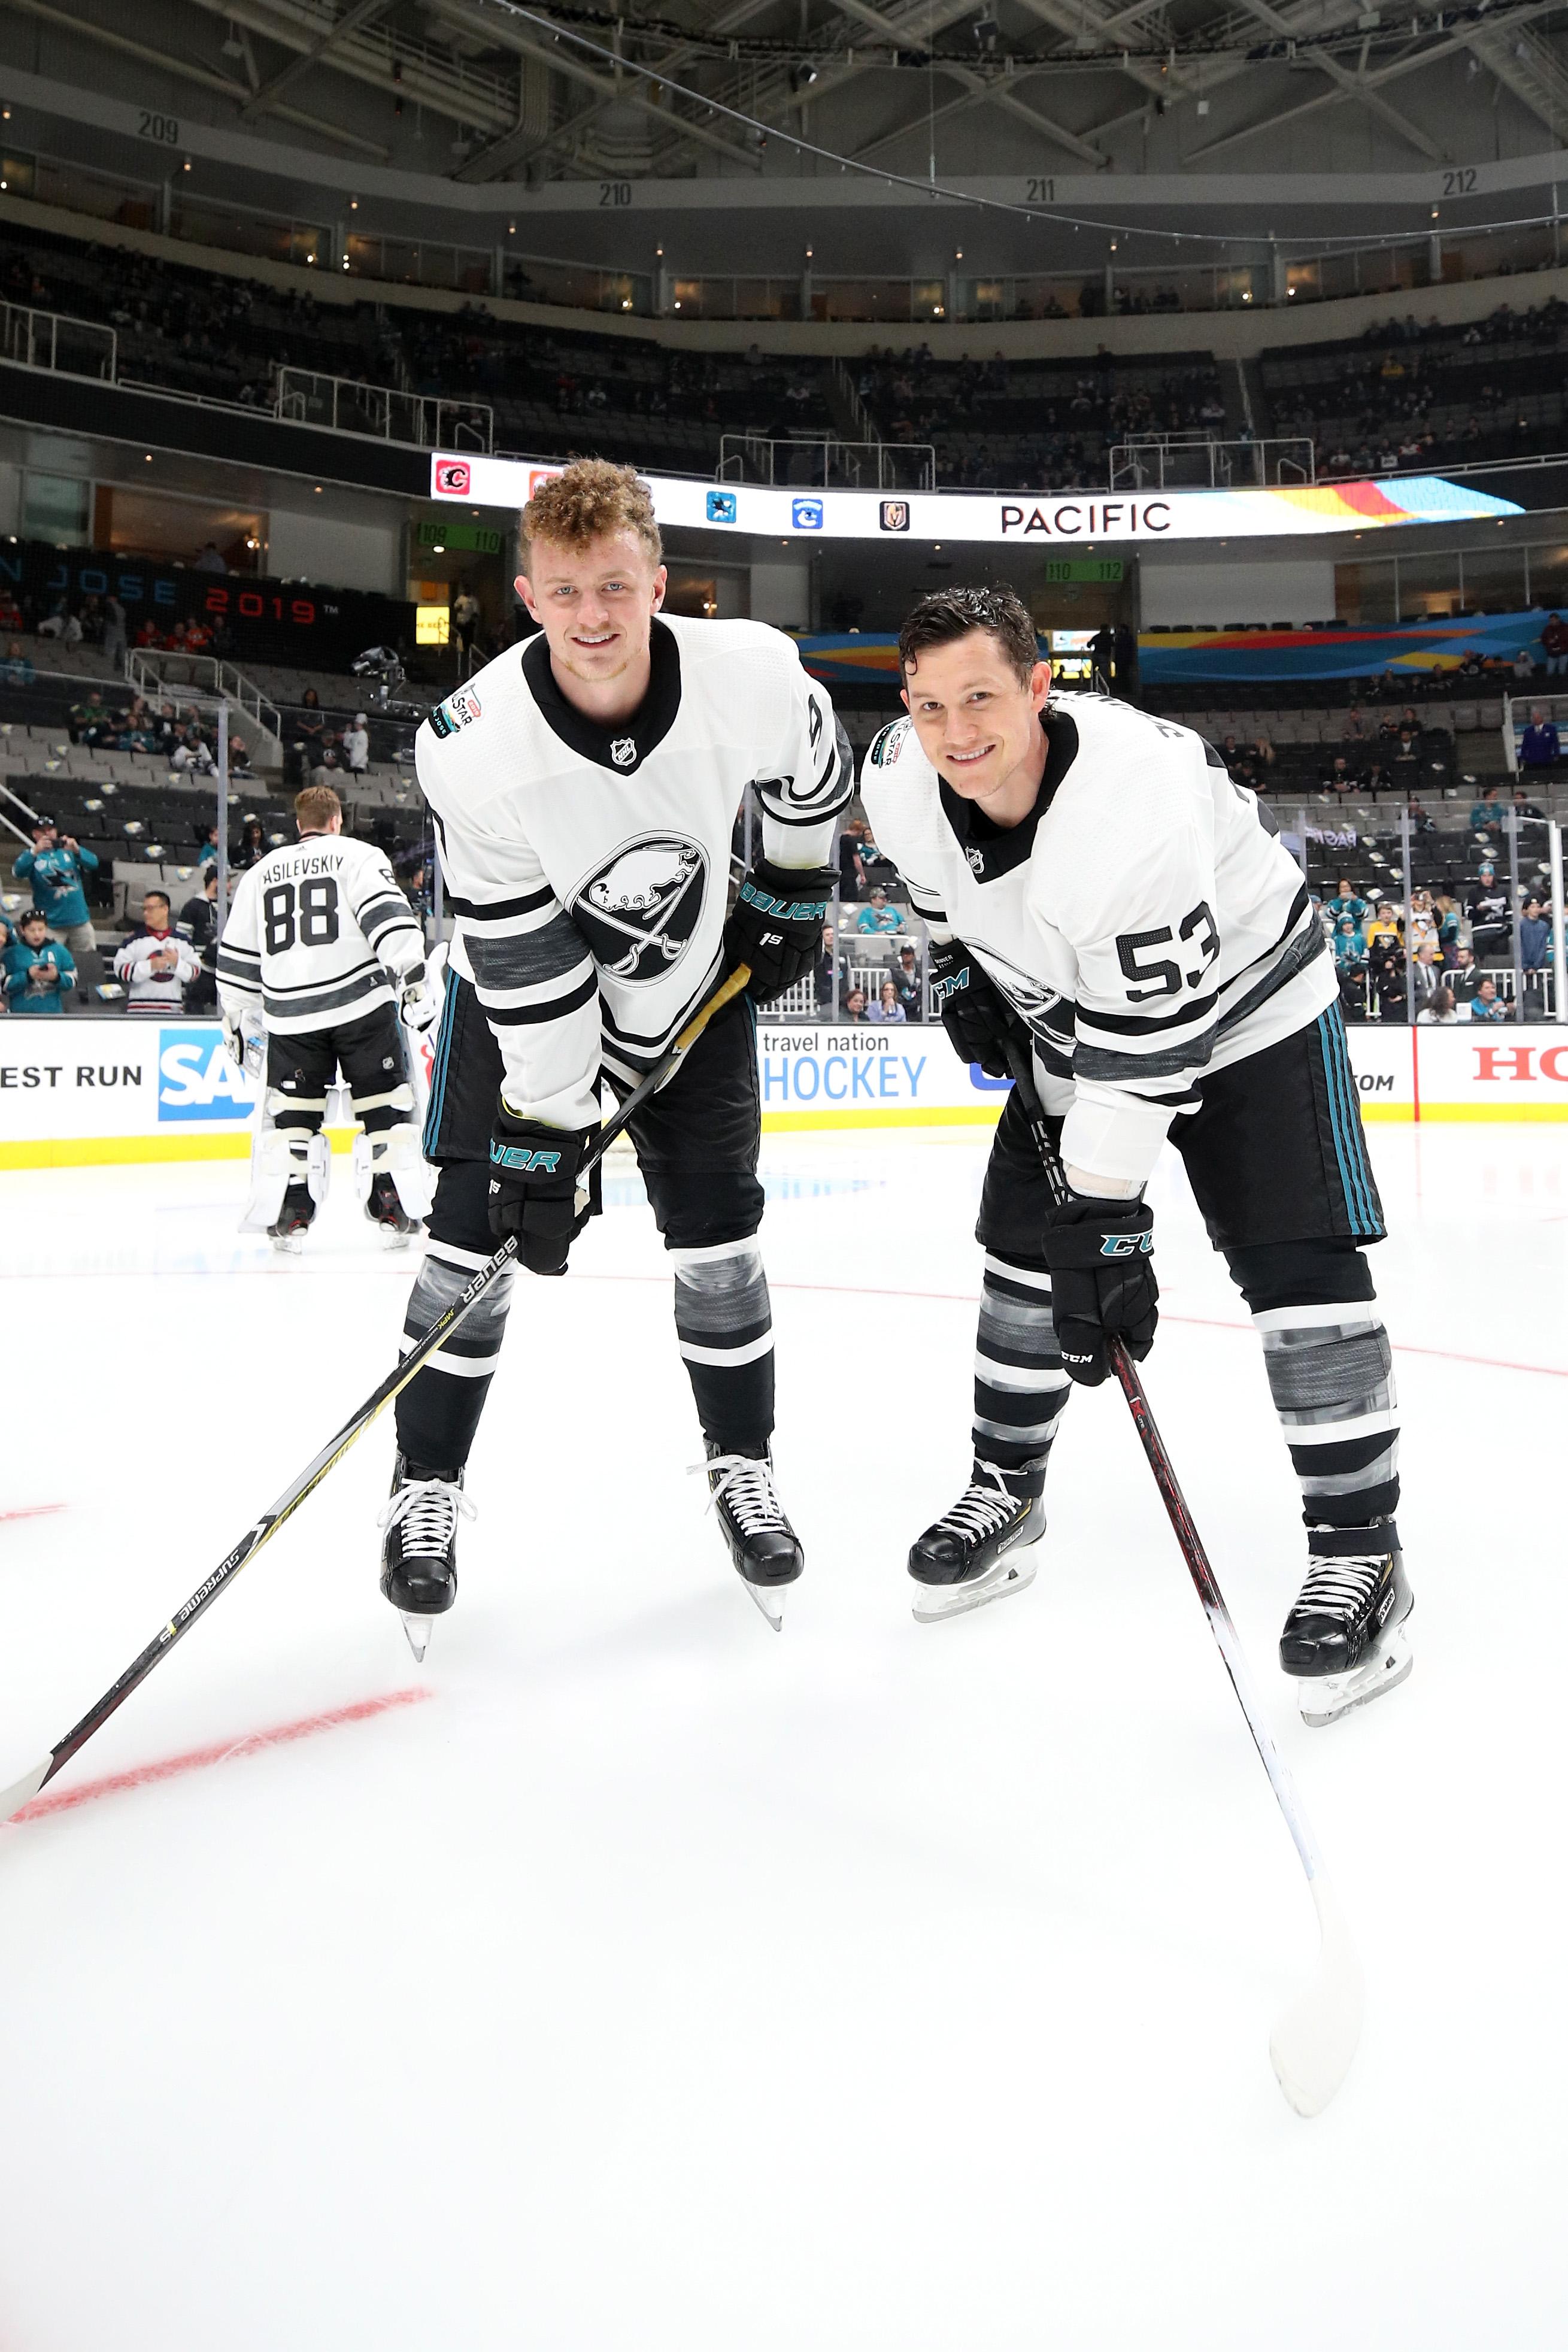 online store e95d5 93598 Eichel & Skinner score but get eliminated in NHL All-Star ...